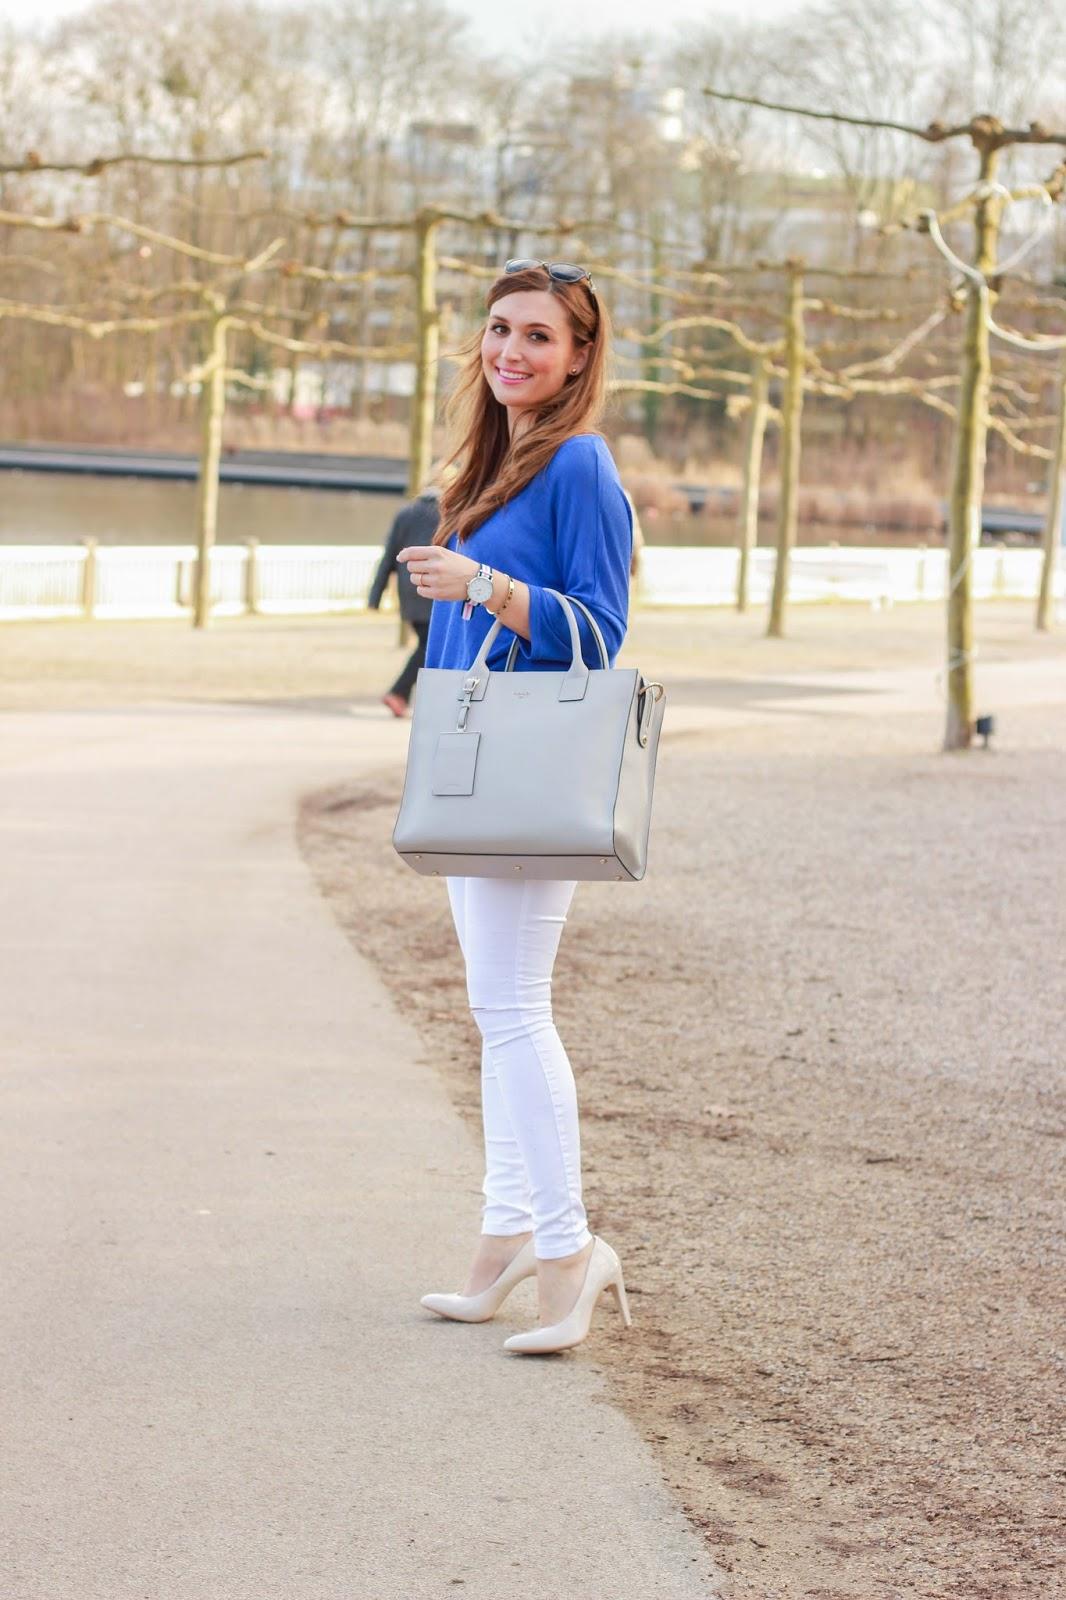 Fashionblogger aus Frankfurt - Frankfurt Blogger - German Fashionblogger - Fashionblog - Weiße Hose - Weiße Jeans - Streetstyleinspiration- Deutsche Fashionblogger -Lifestyleblog